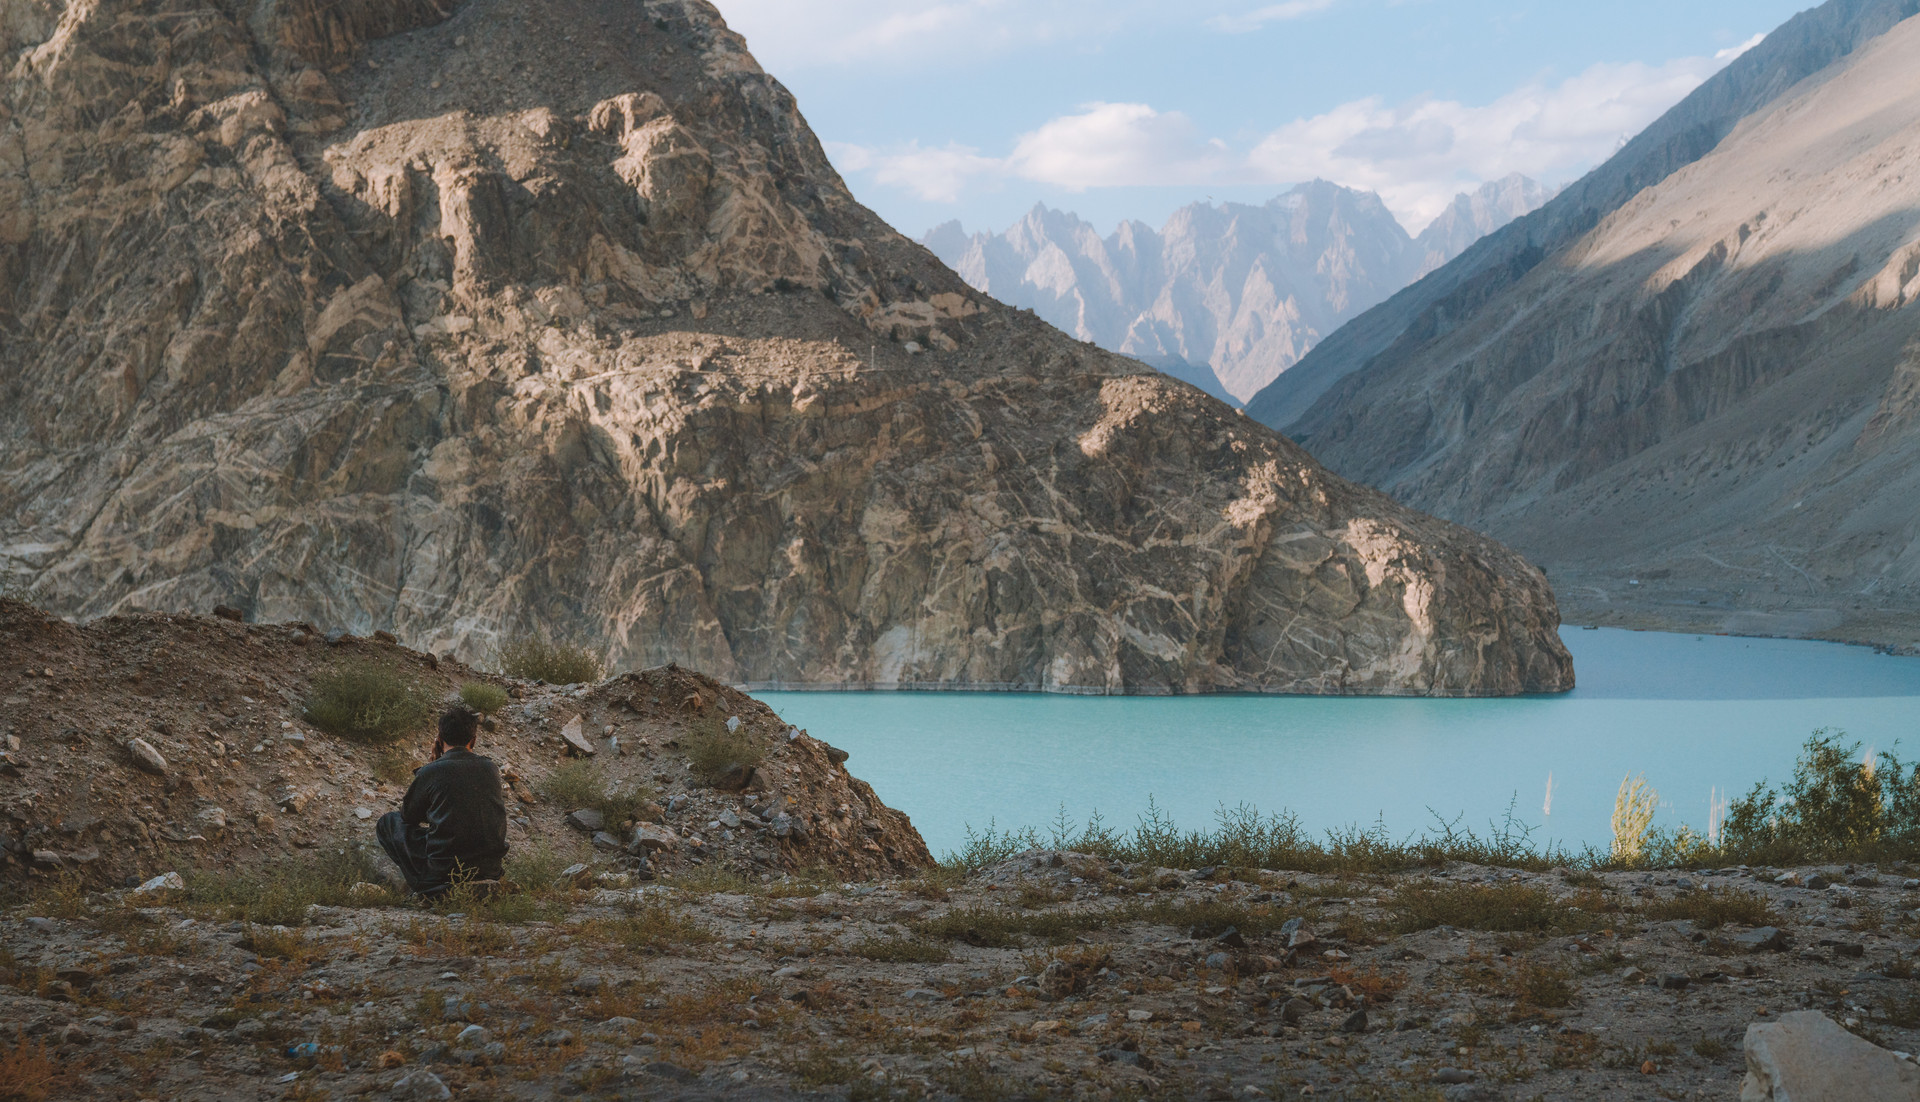 Pakistan-06498.jpg